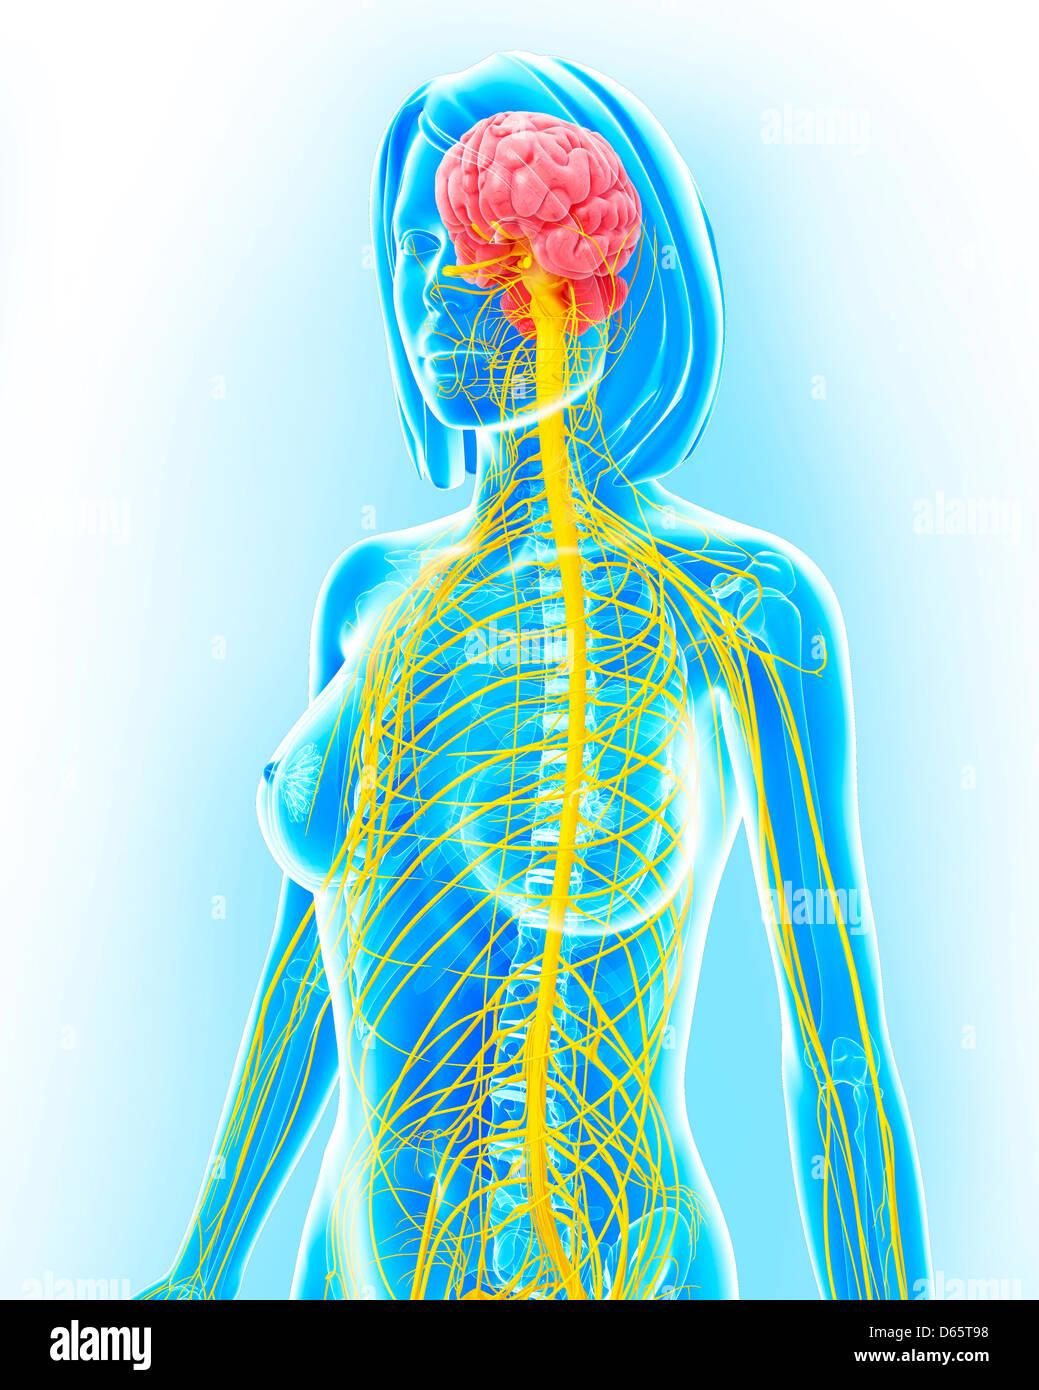 Female nervous system artwork stock photo 55447876 alamy female nervous system artwork ccuart Image collections